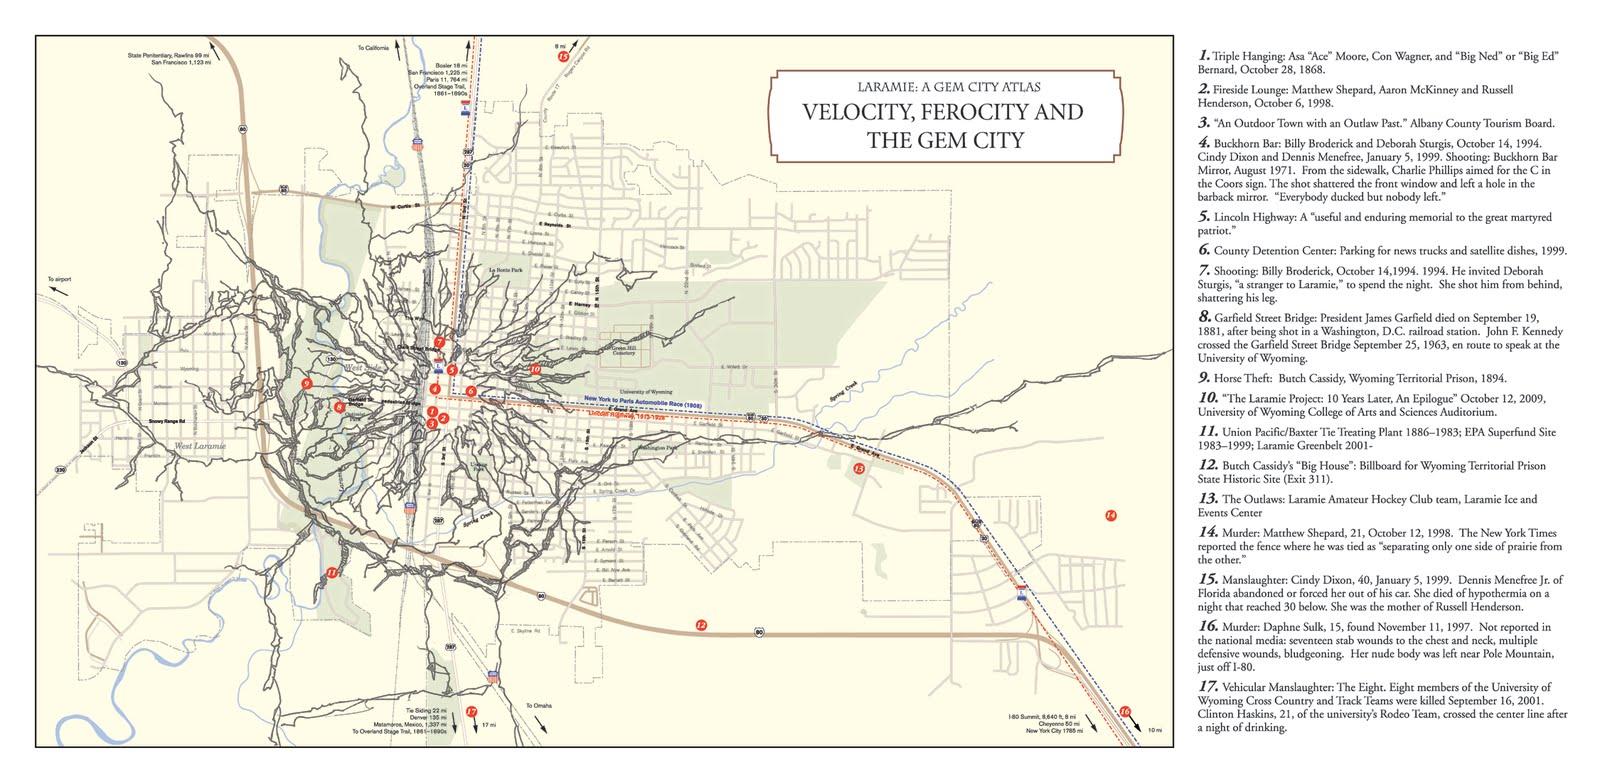 velocity ferocity and the gem city key map